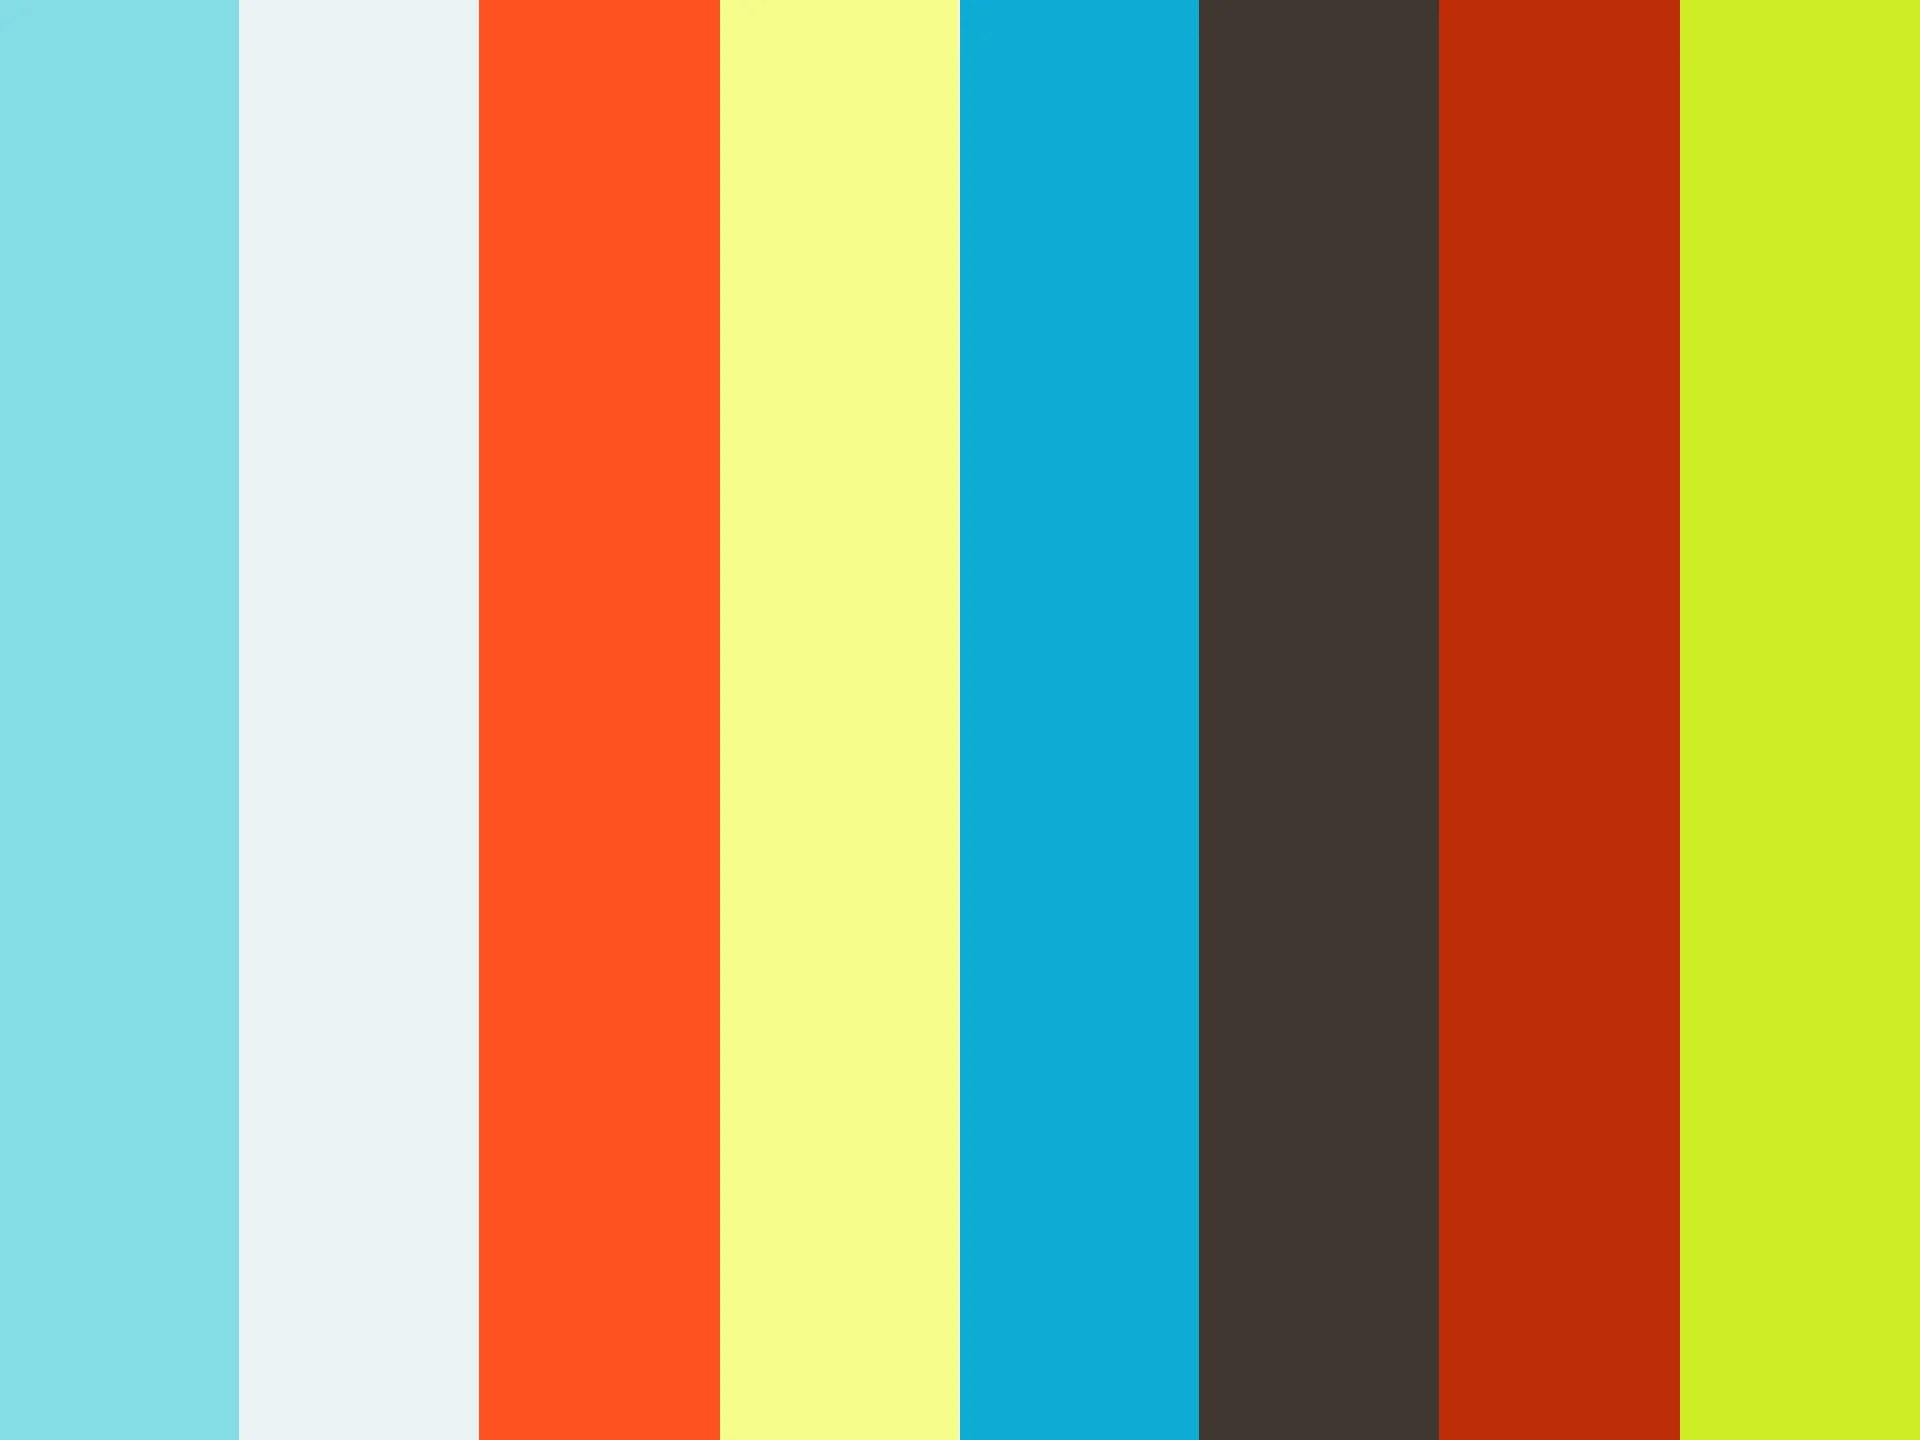 lean six sigma contingency diagram [ 1280 x 720 Pixel ]